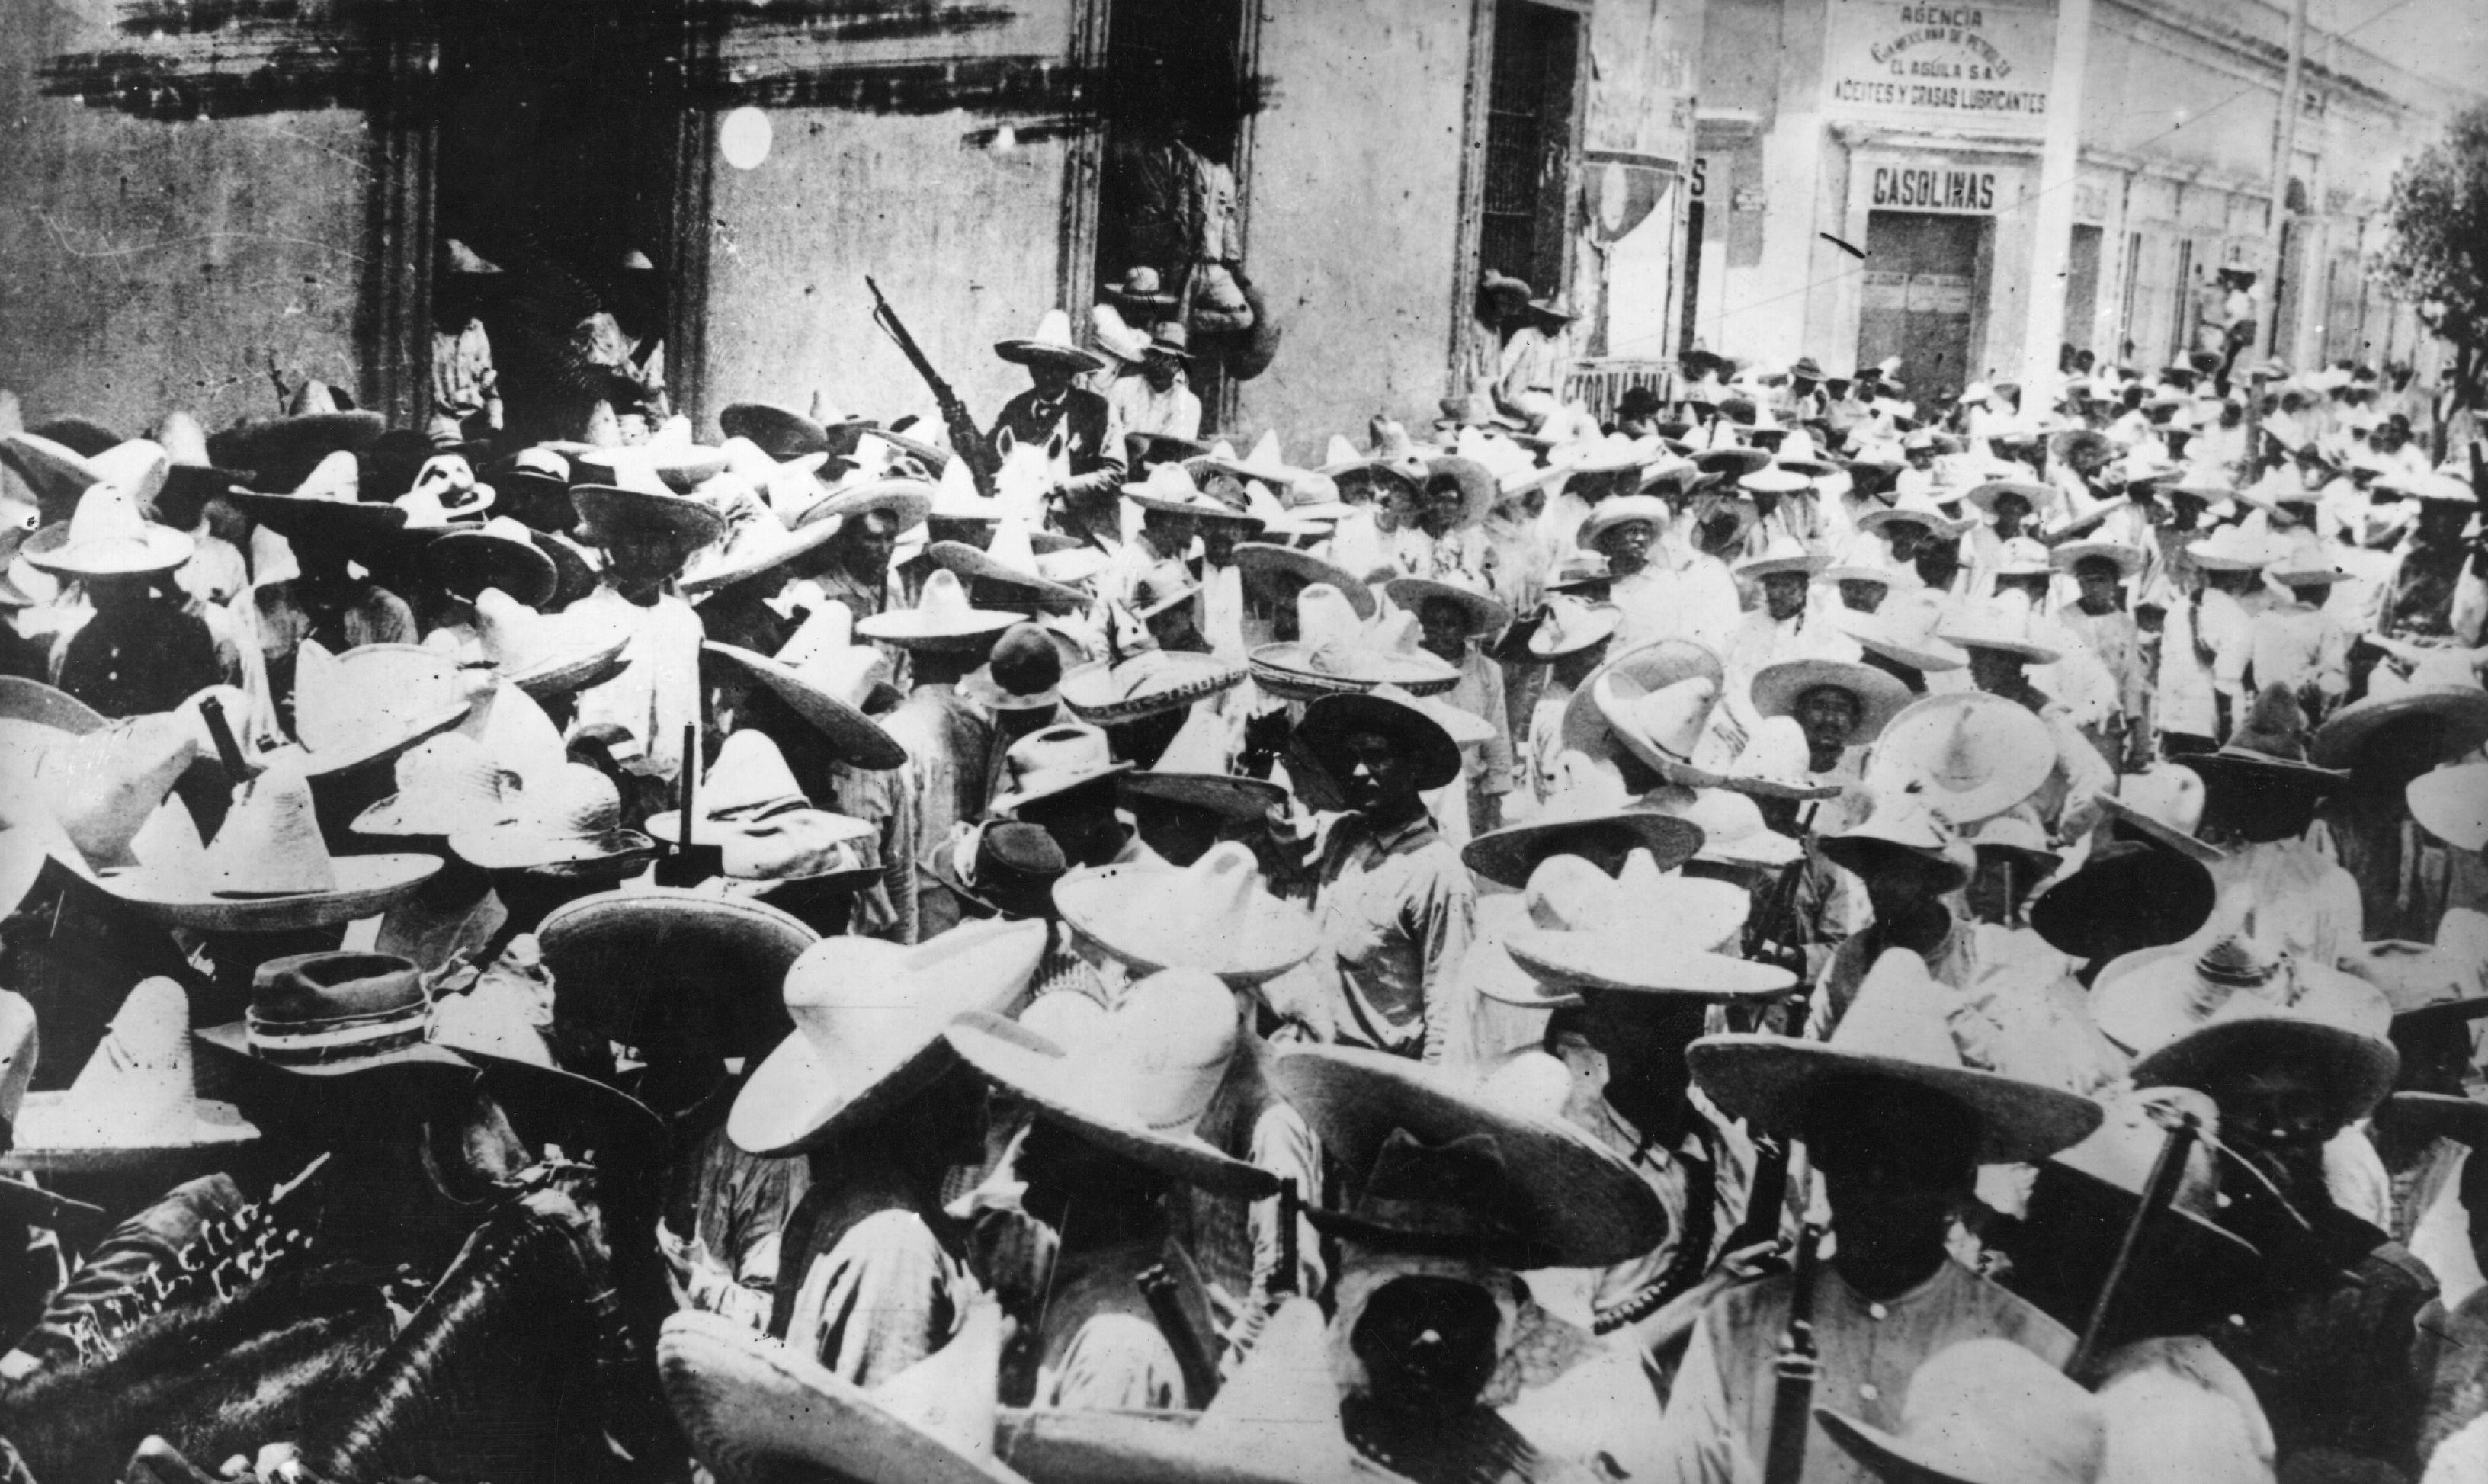 revolucion-trabajadores-obreros-porfirio-diaz-mexico-revolucion-mexicana